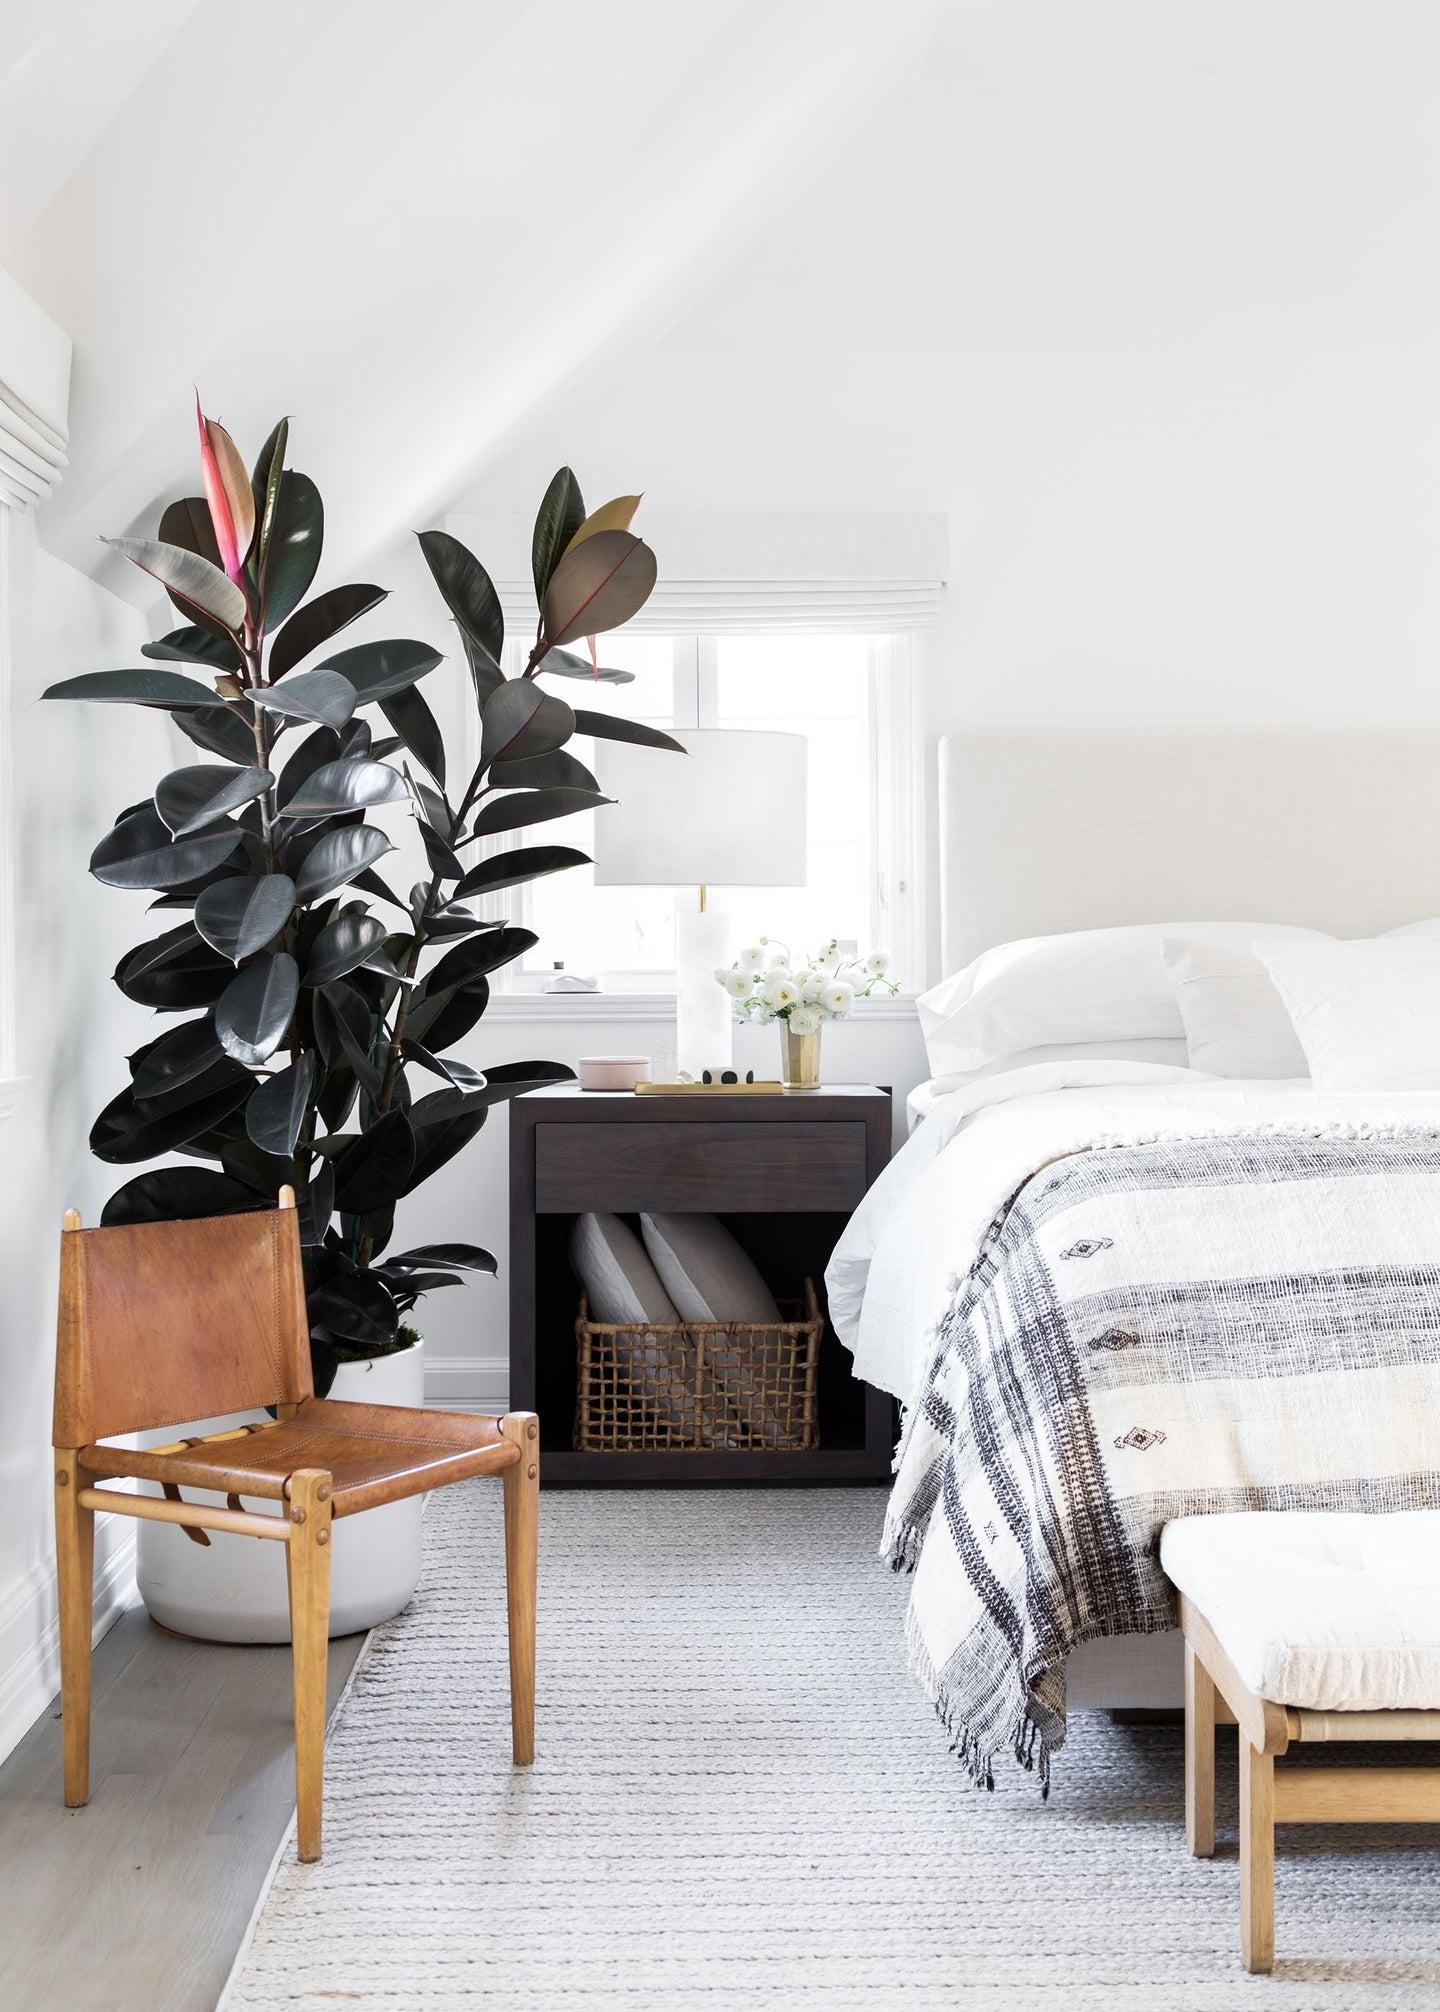 Neutral-toned bedroom